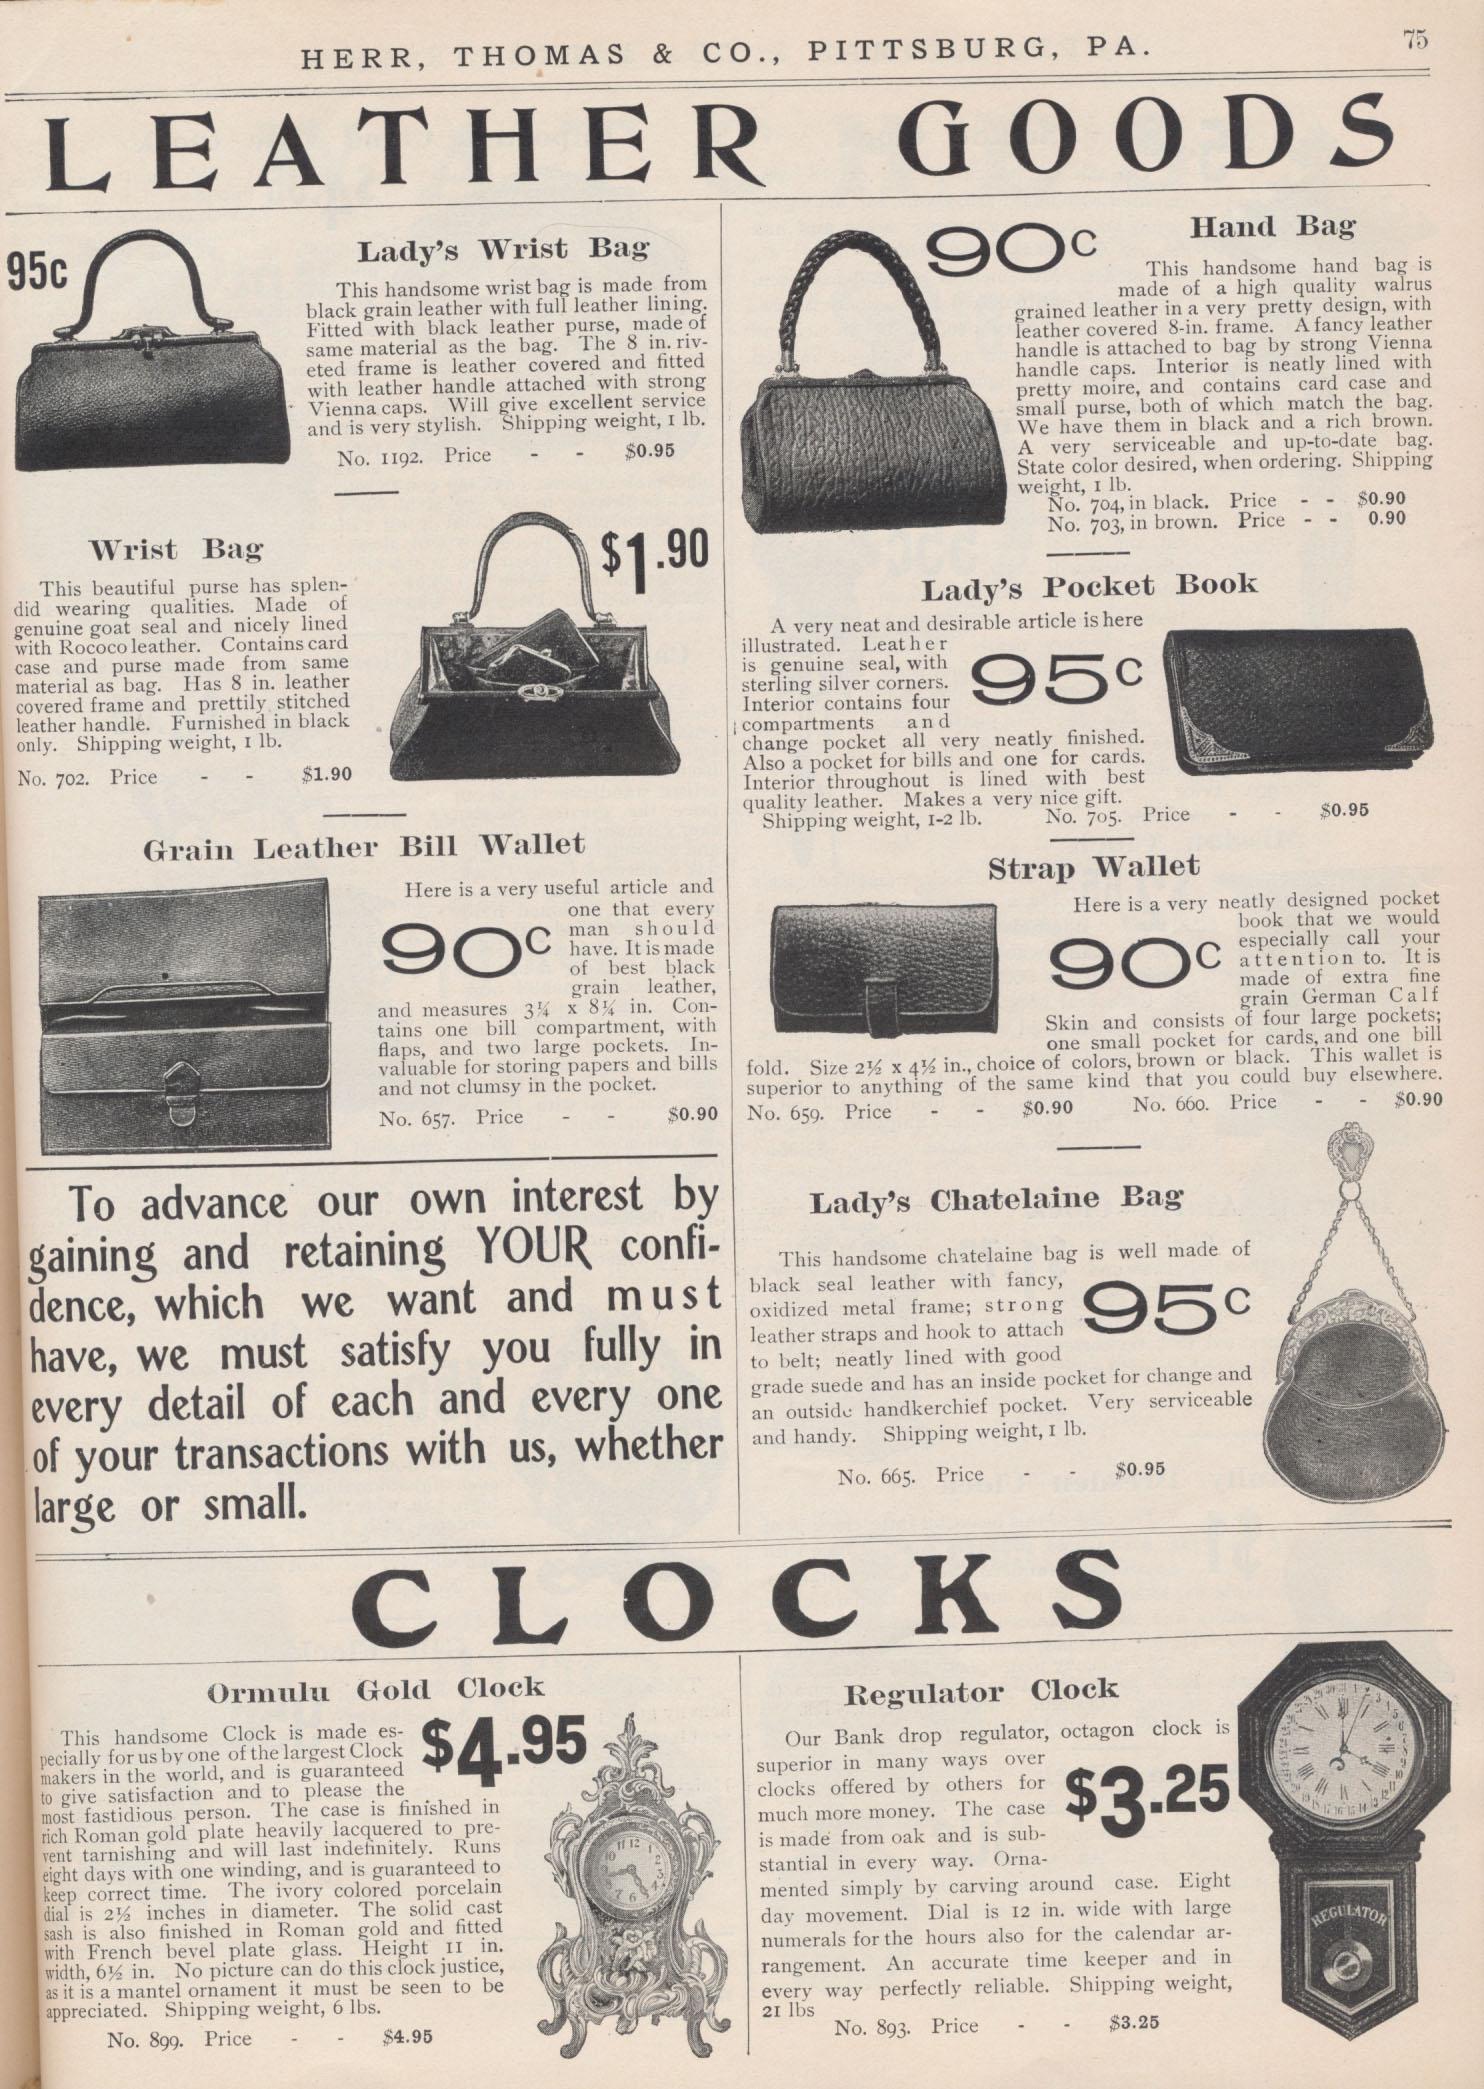 Lady's Wrist Bag, Wrist Bag, Grain Leather Bill Wallet, Hand Bag, Lady's Pocket Book, Strap Wallet, Lady's Chatelaine Bag, Ormulu Gold Clock, Regulator Clock